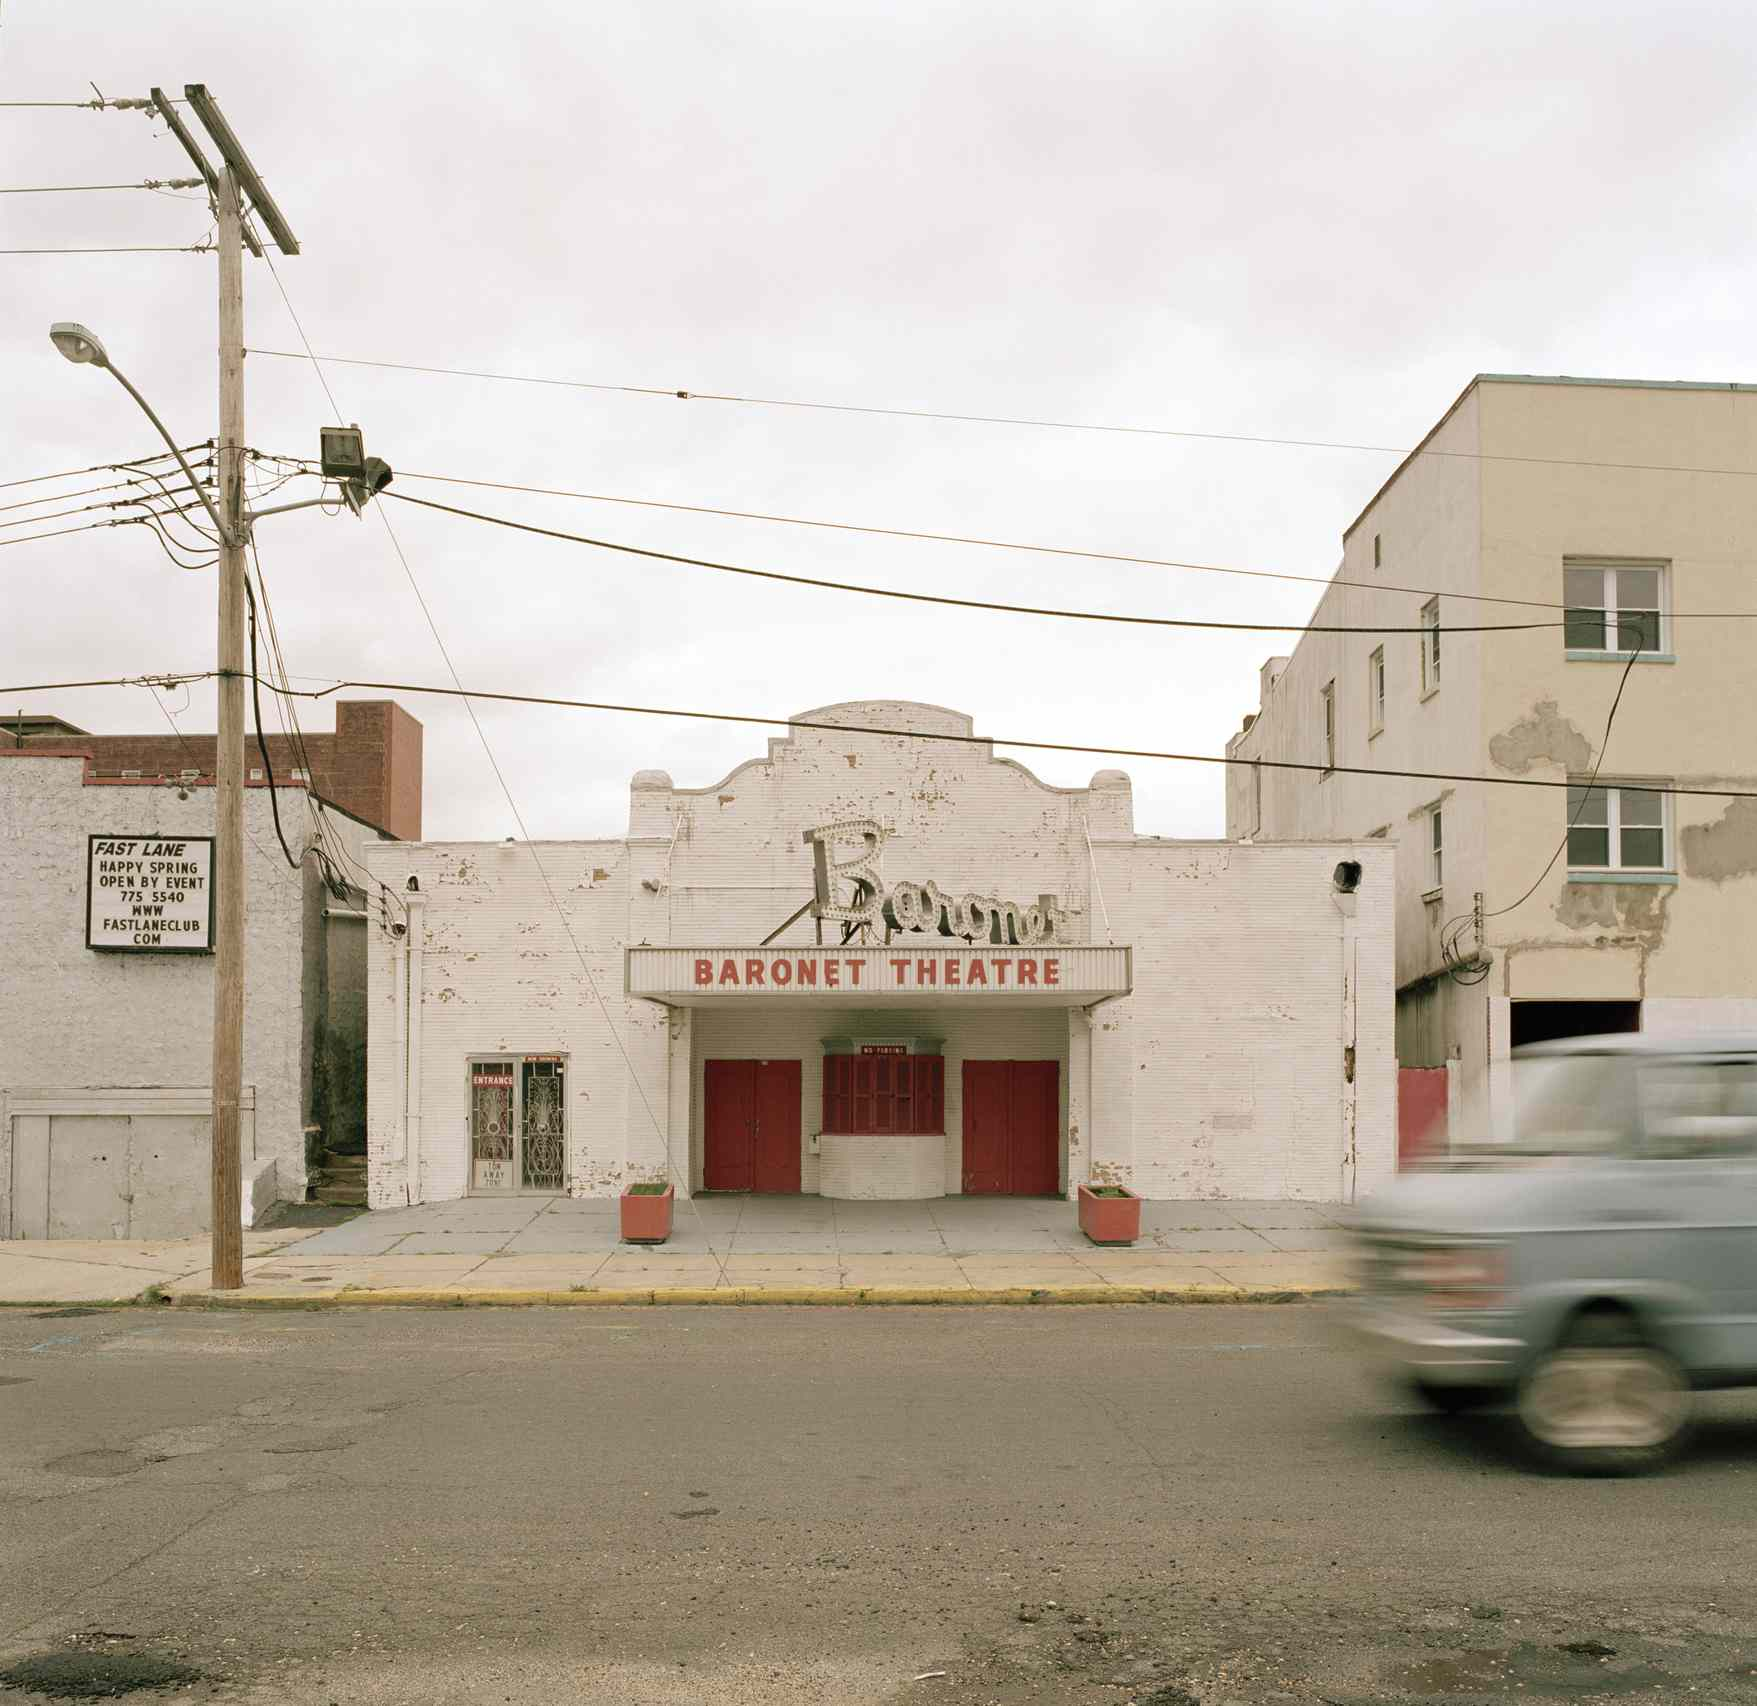 Baronet Theatre, Asbury Park, New Jersey, U.S.A.